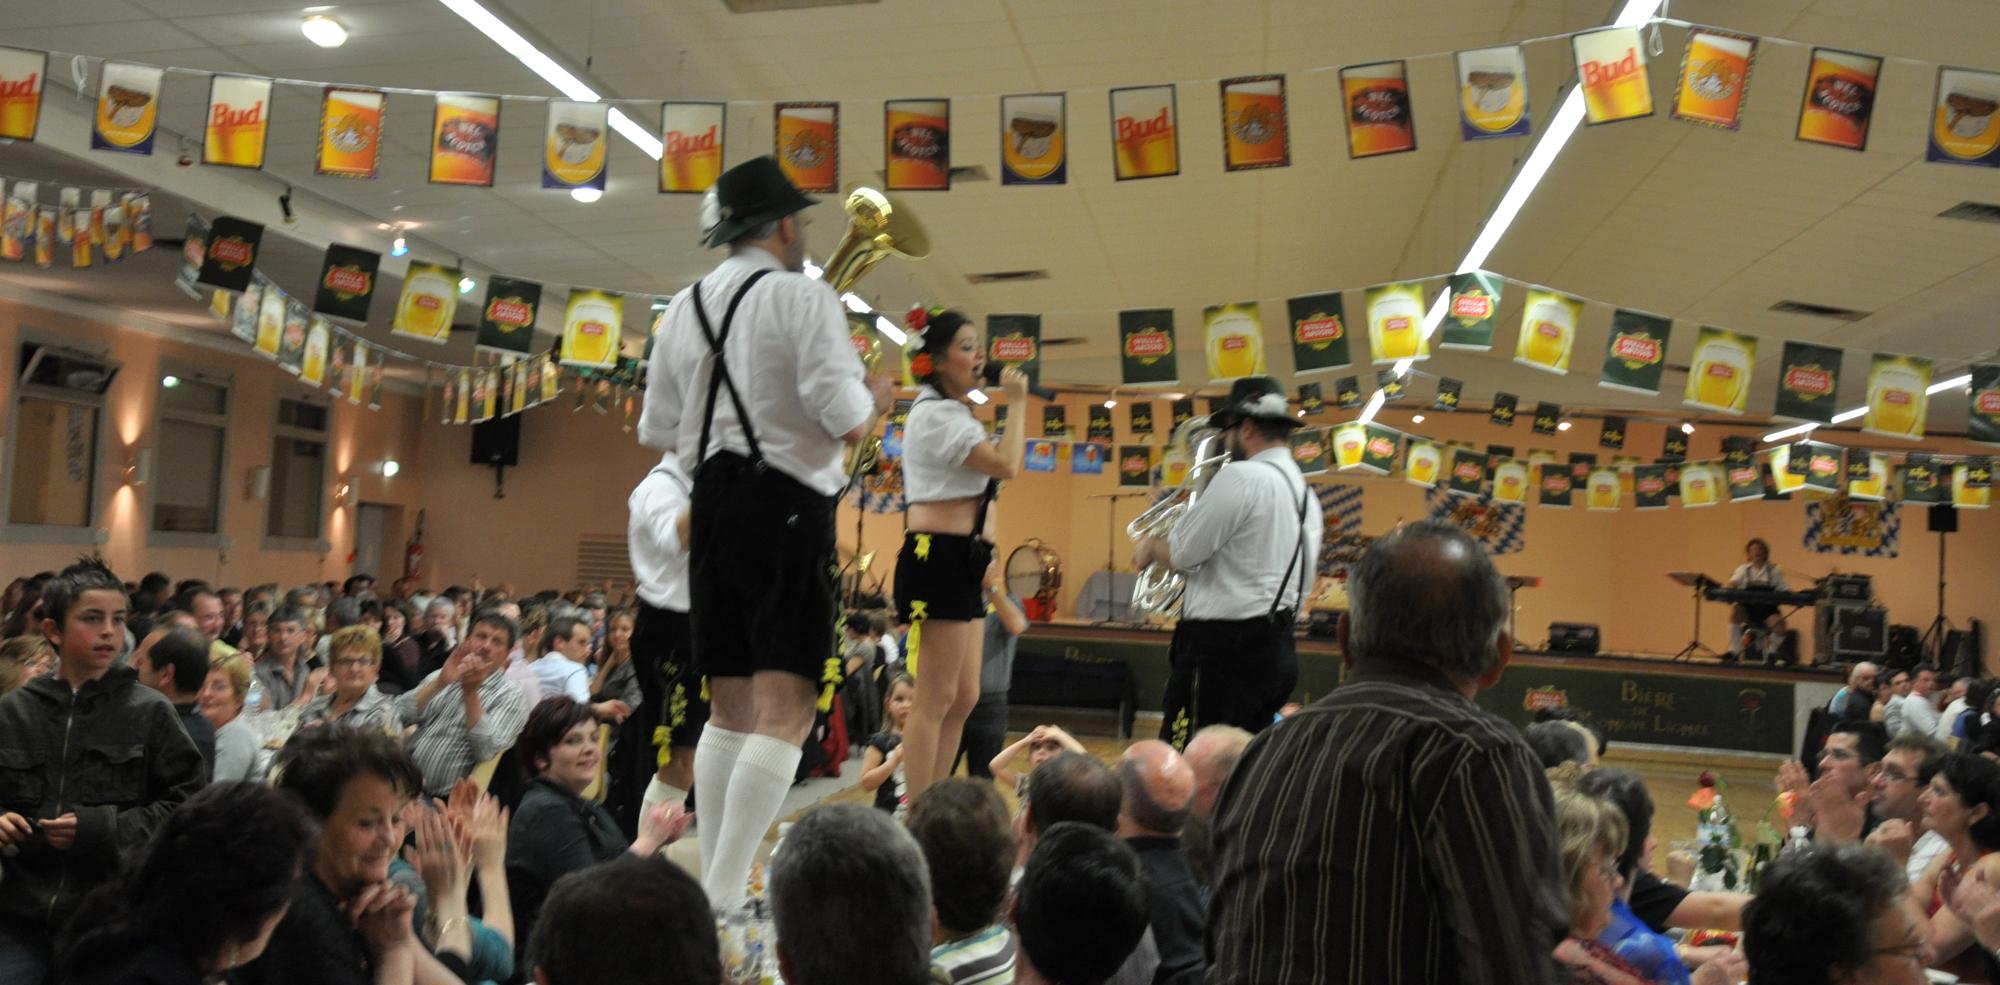 Mulsanne 72-2010-orchestre bavarois-soirée bavaroise 1